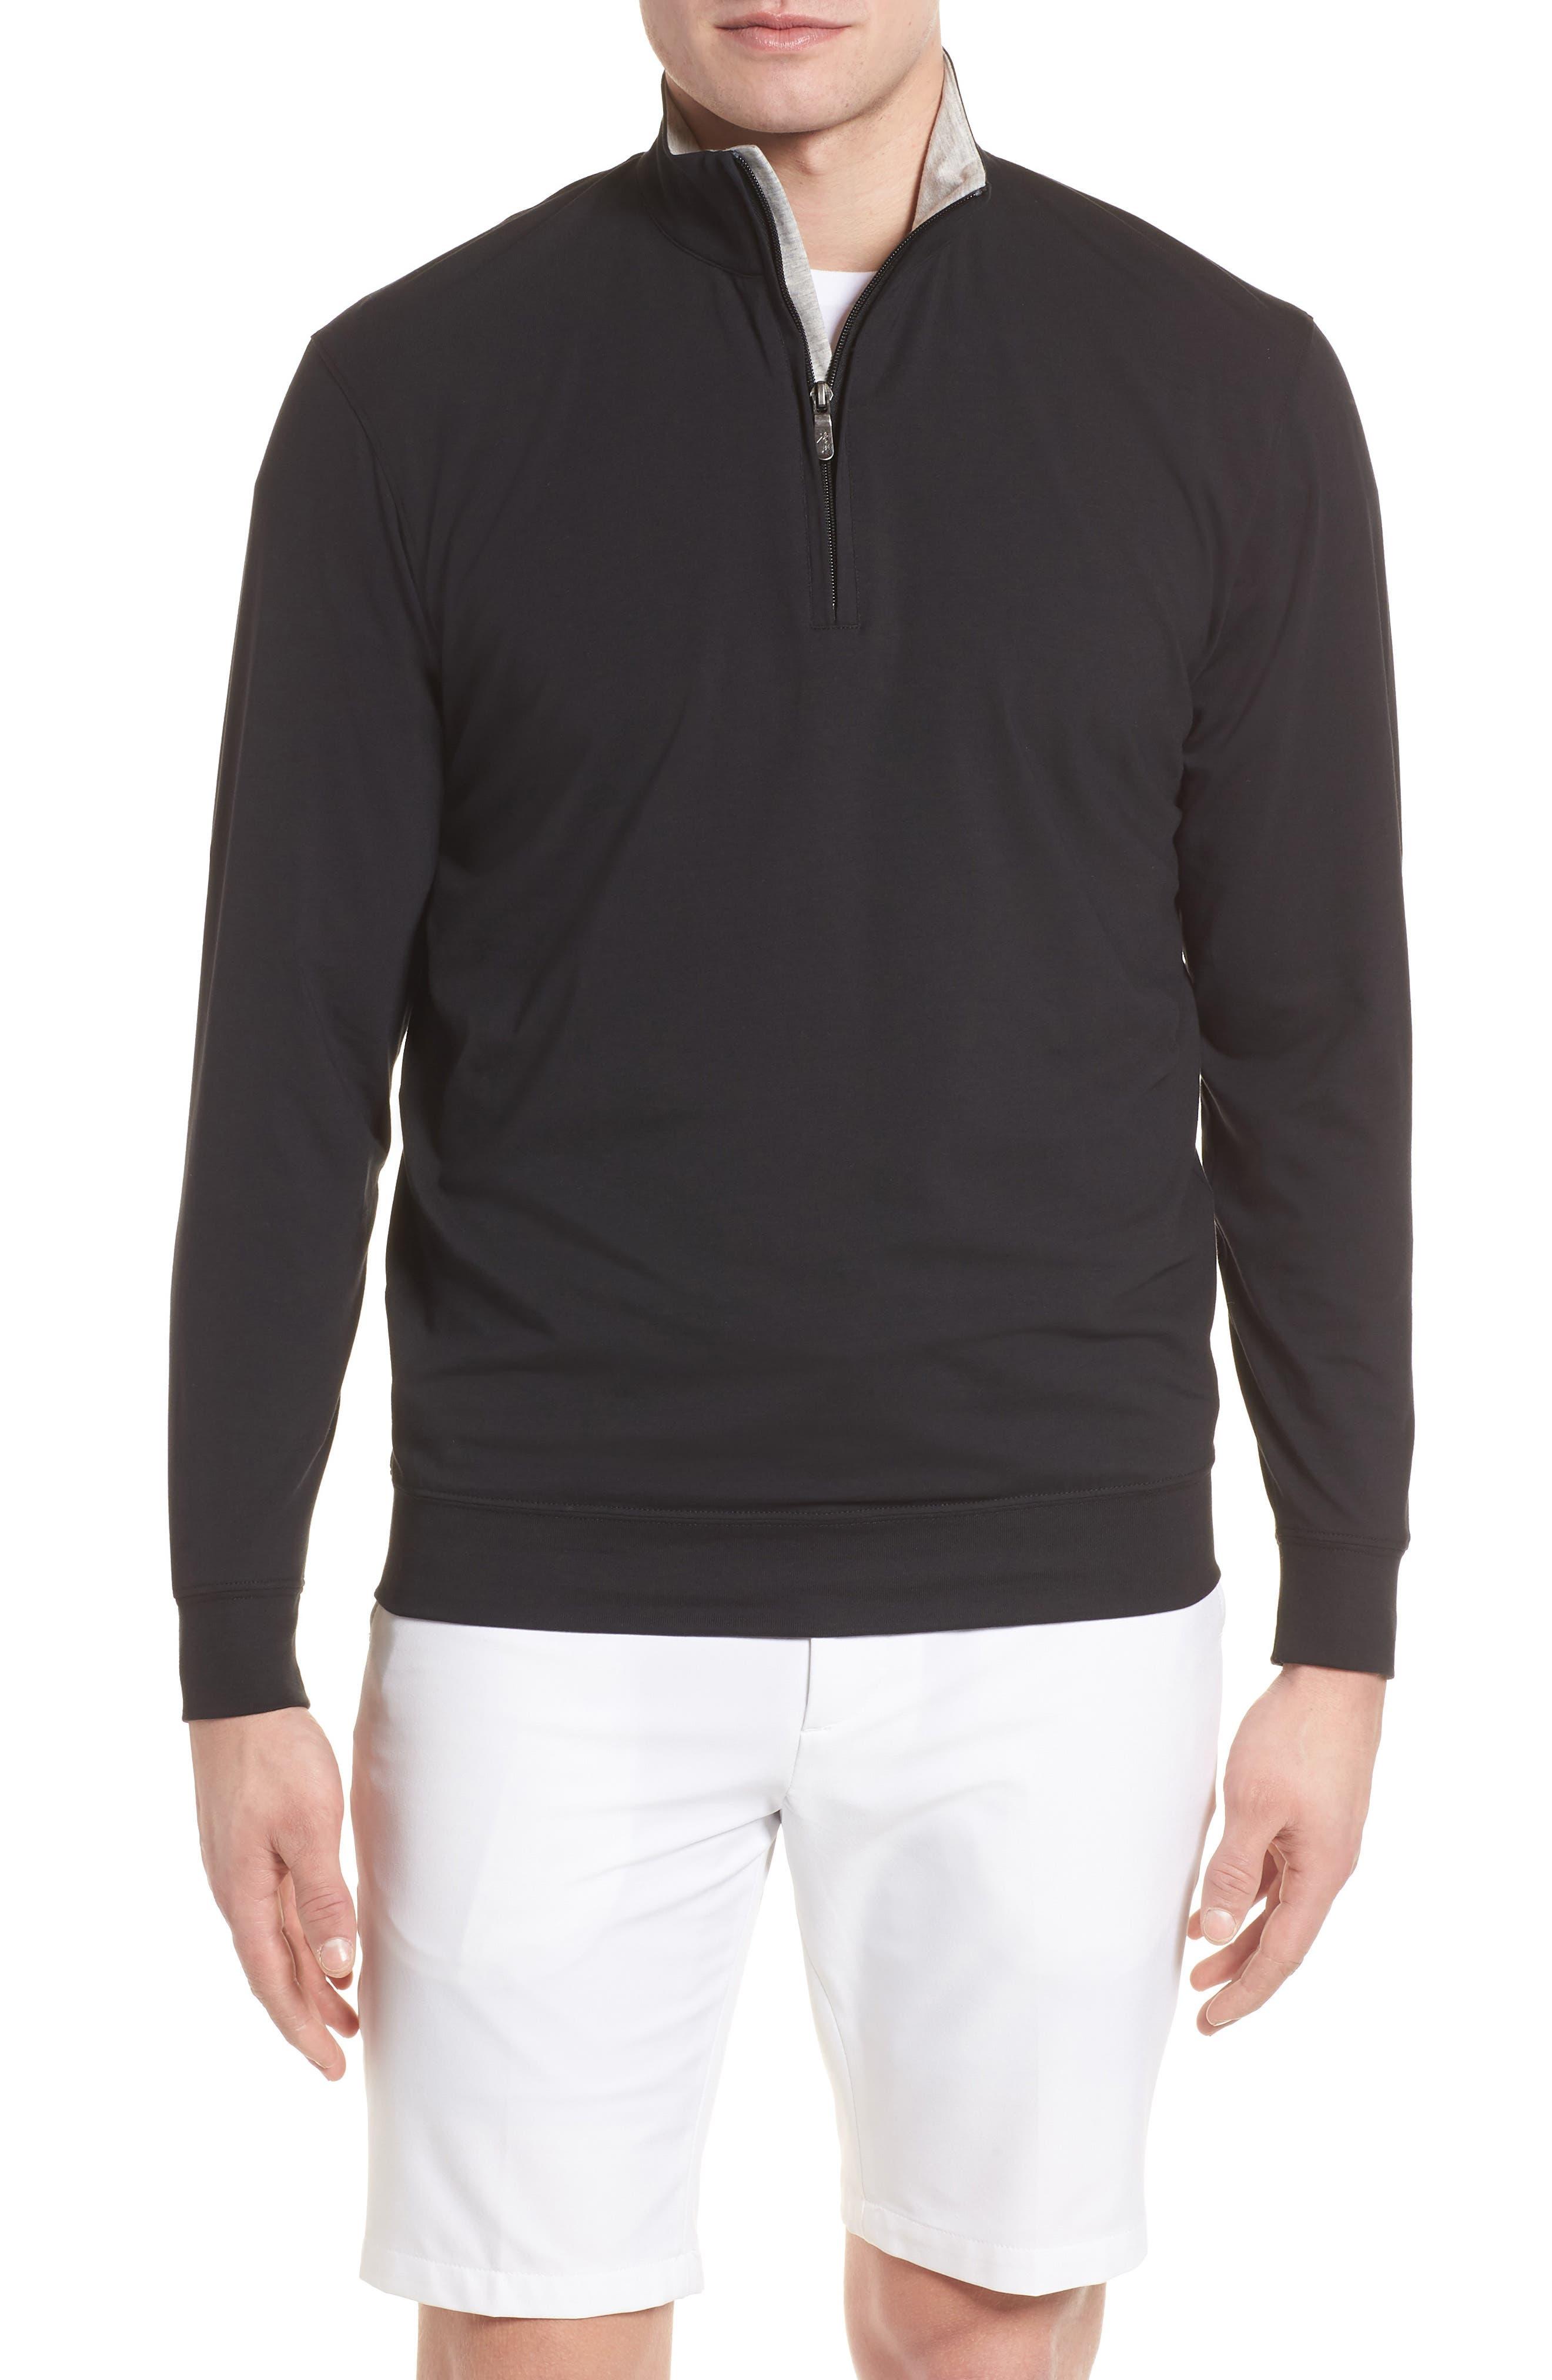 PTO Liquid Stretch Quarter Zip Pullover, Main, color, 001